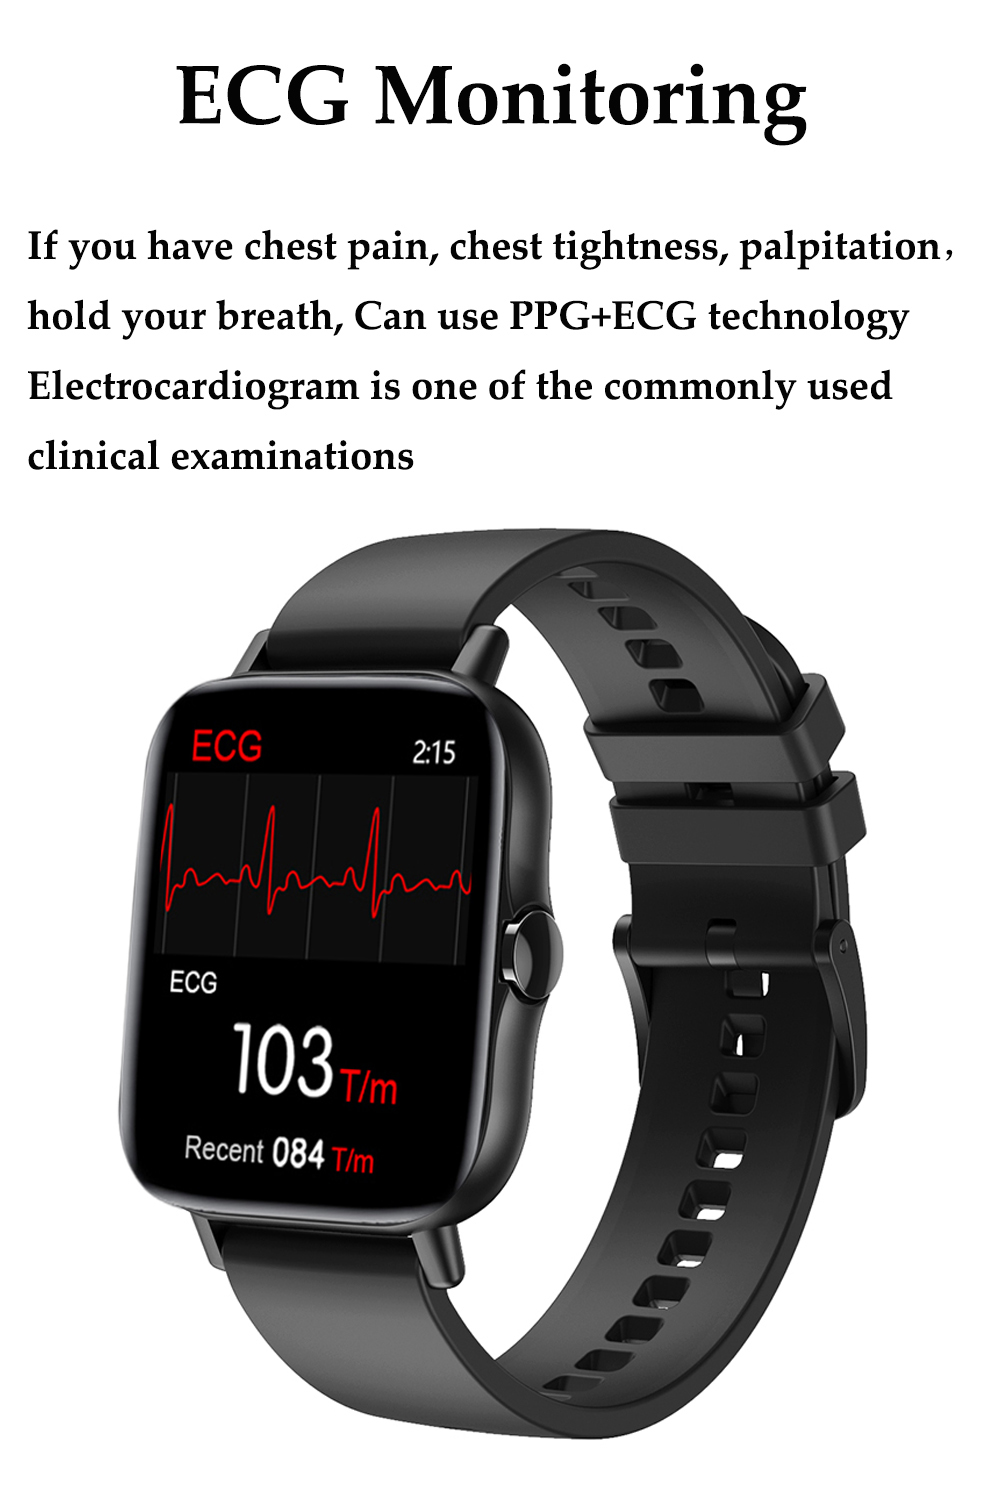 Hdc4a51548c814f31b4896f950d0c4f8aA Reloj Inteligente Mujer Smartwatch Android Men 2021 Smart Watch Man Bluetooth Call Smartwatch Women For Xiaomi Mi Phone GTS 2